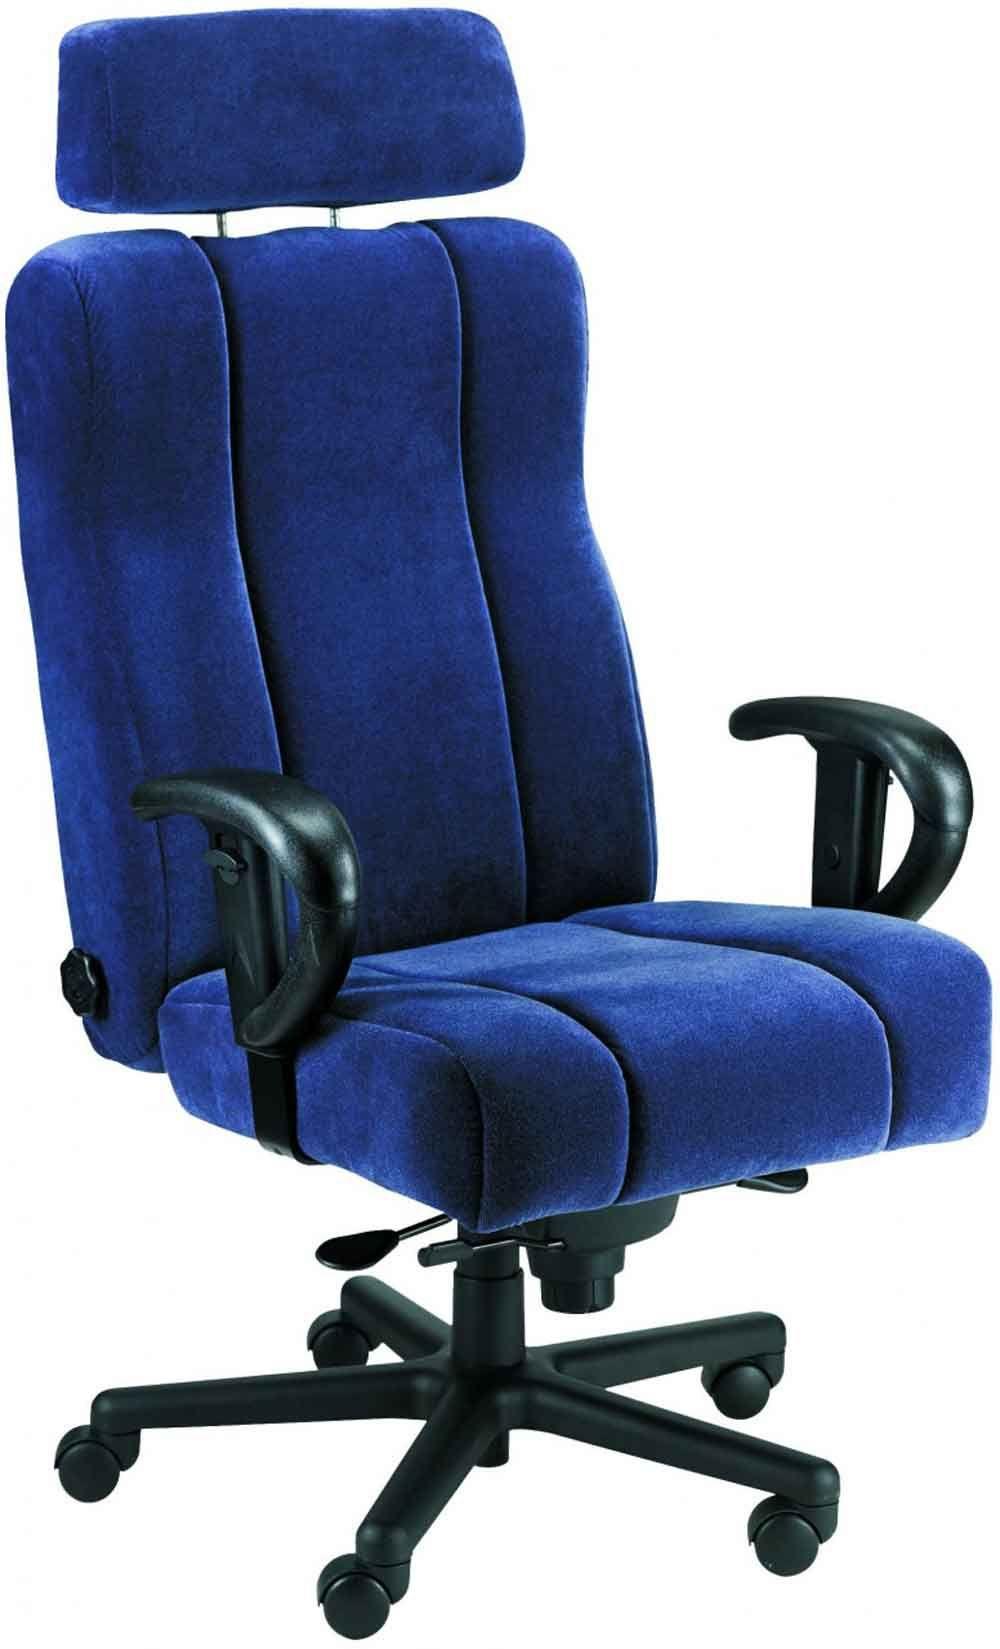 Universal Office Chair Headrest Attachment Office Chair Tall Office Chairs Best Office Chair